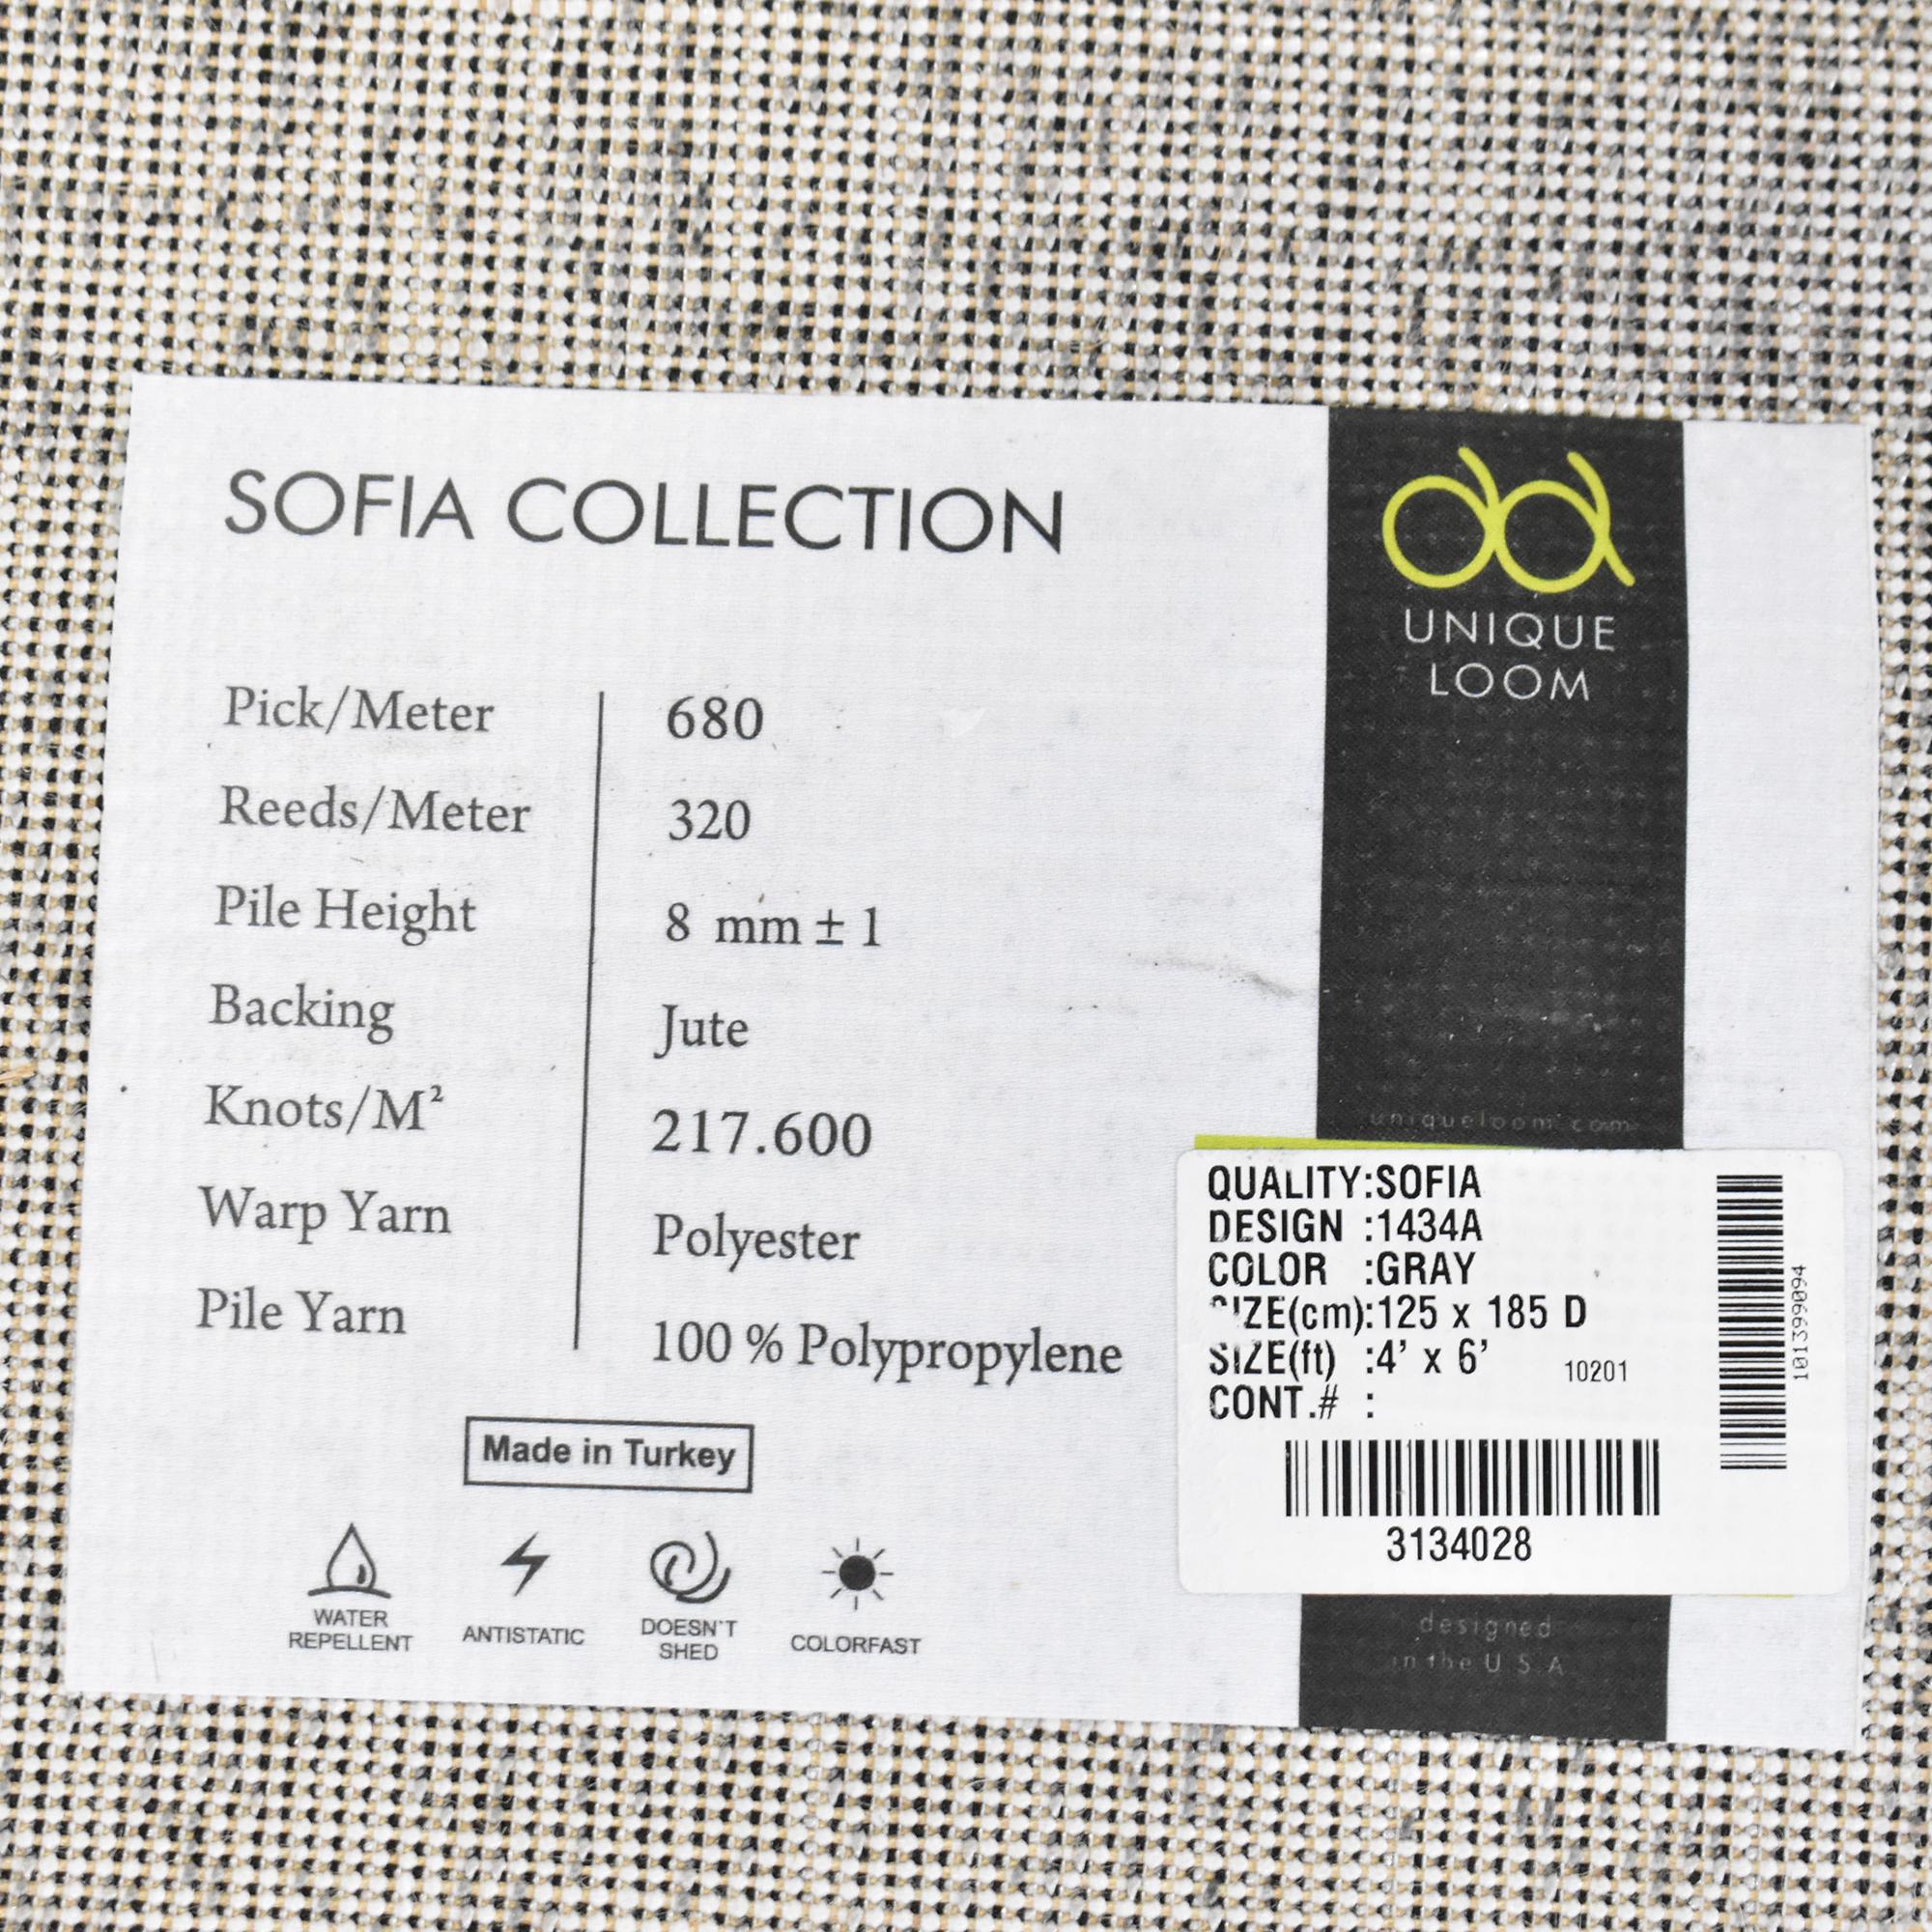 Unique Loom Sofia Collection Area Rug / Decor